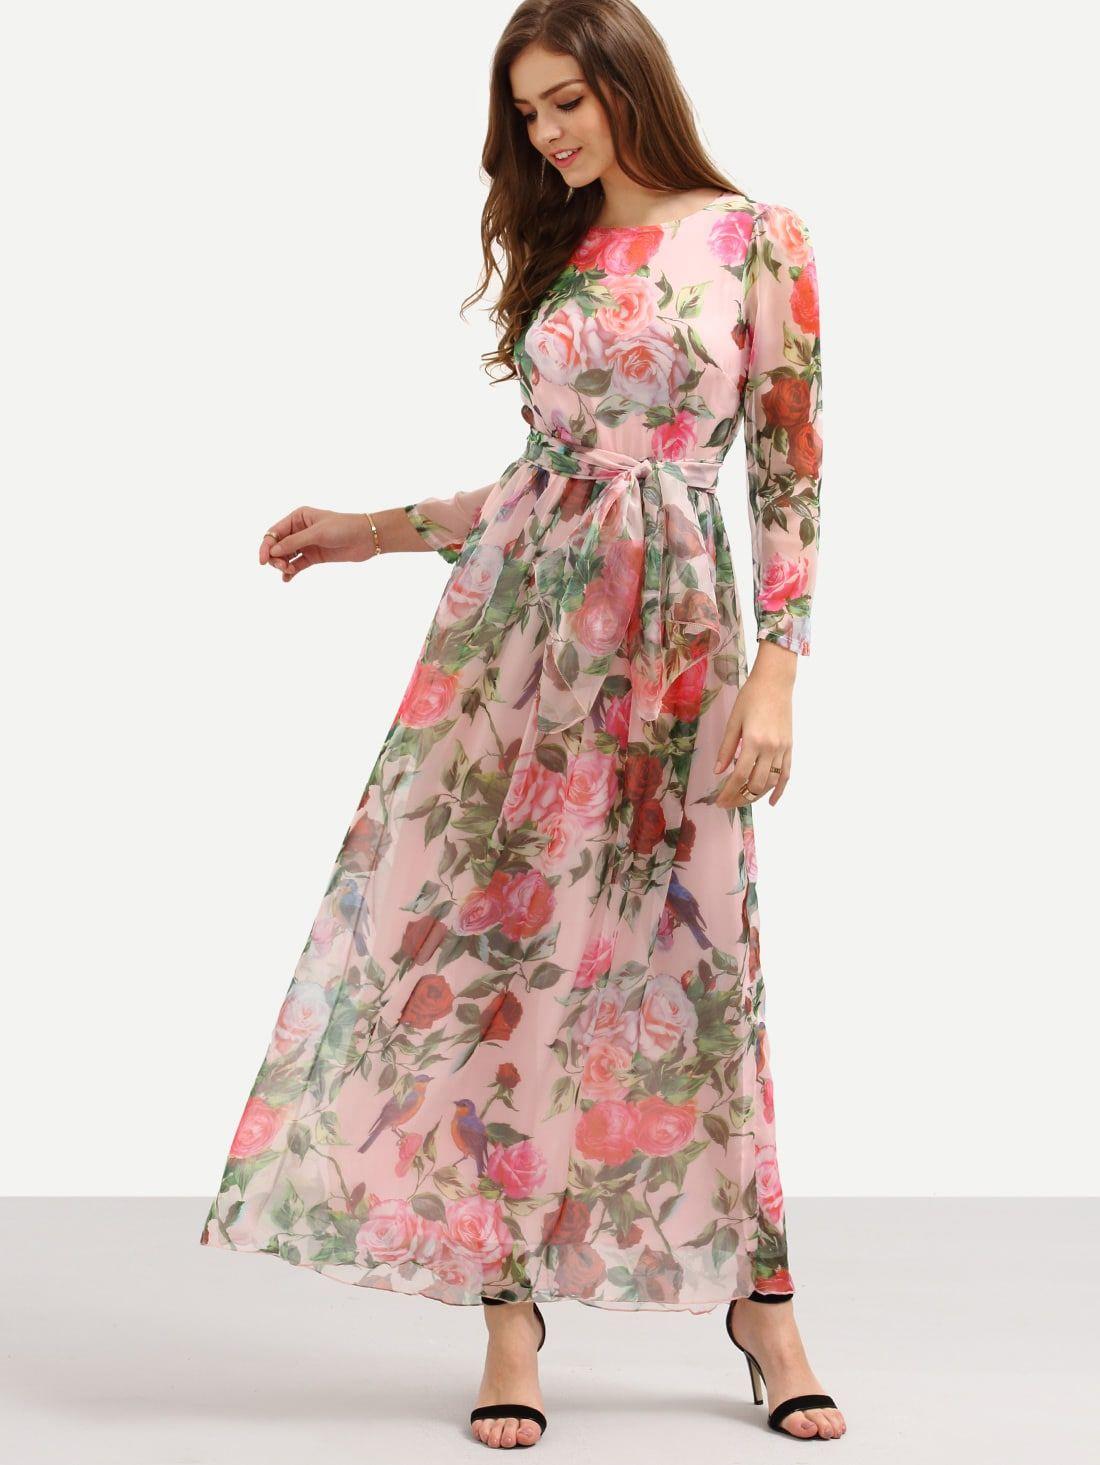 d26a40c2014 Self-Tie Rose Print Chiffon Romantic Dress -SheIn(Sheinside ...